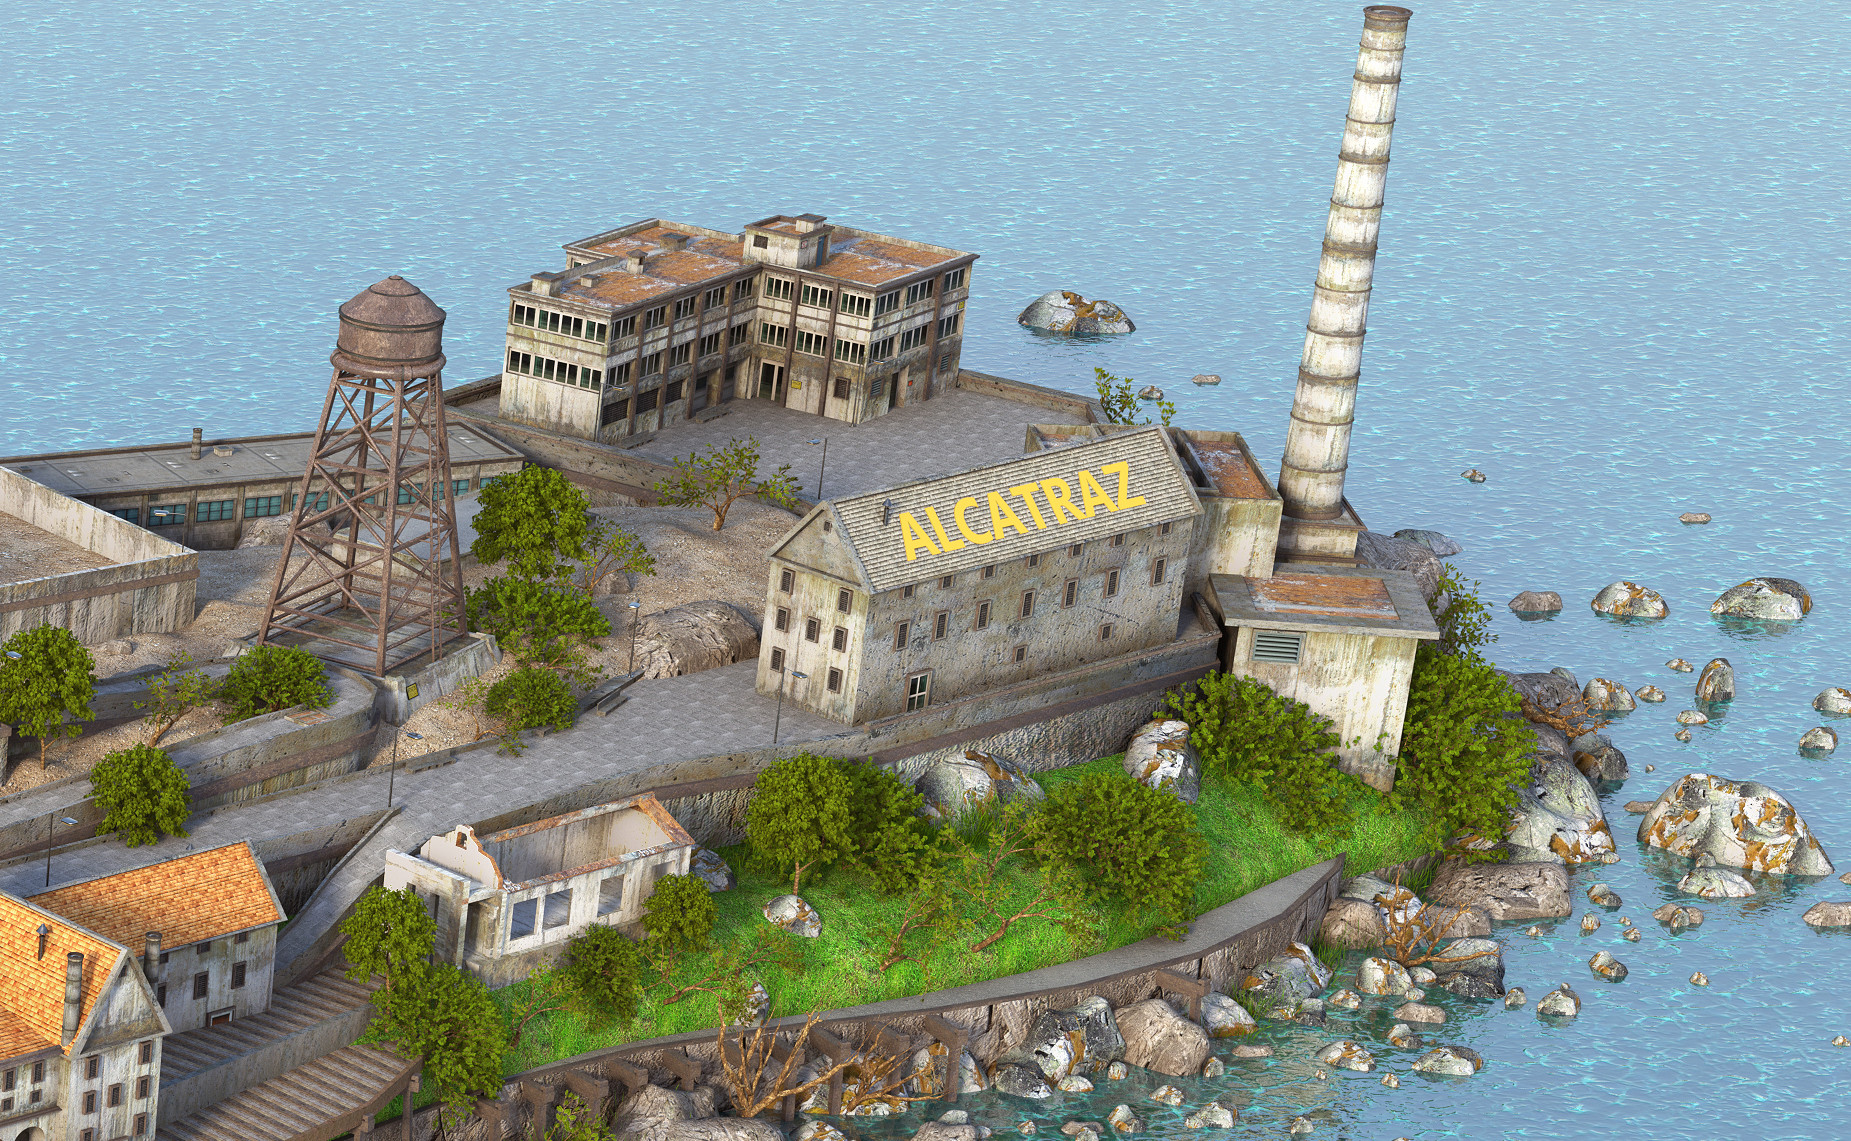 Marc mons alcatraz4